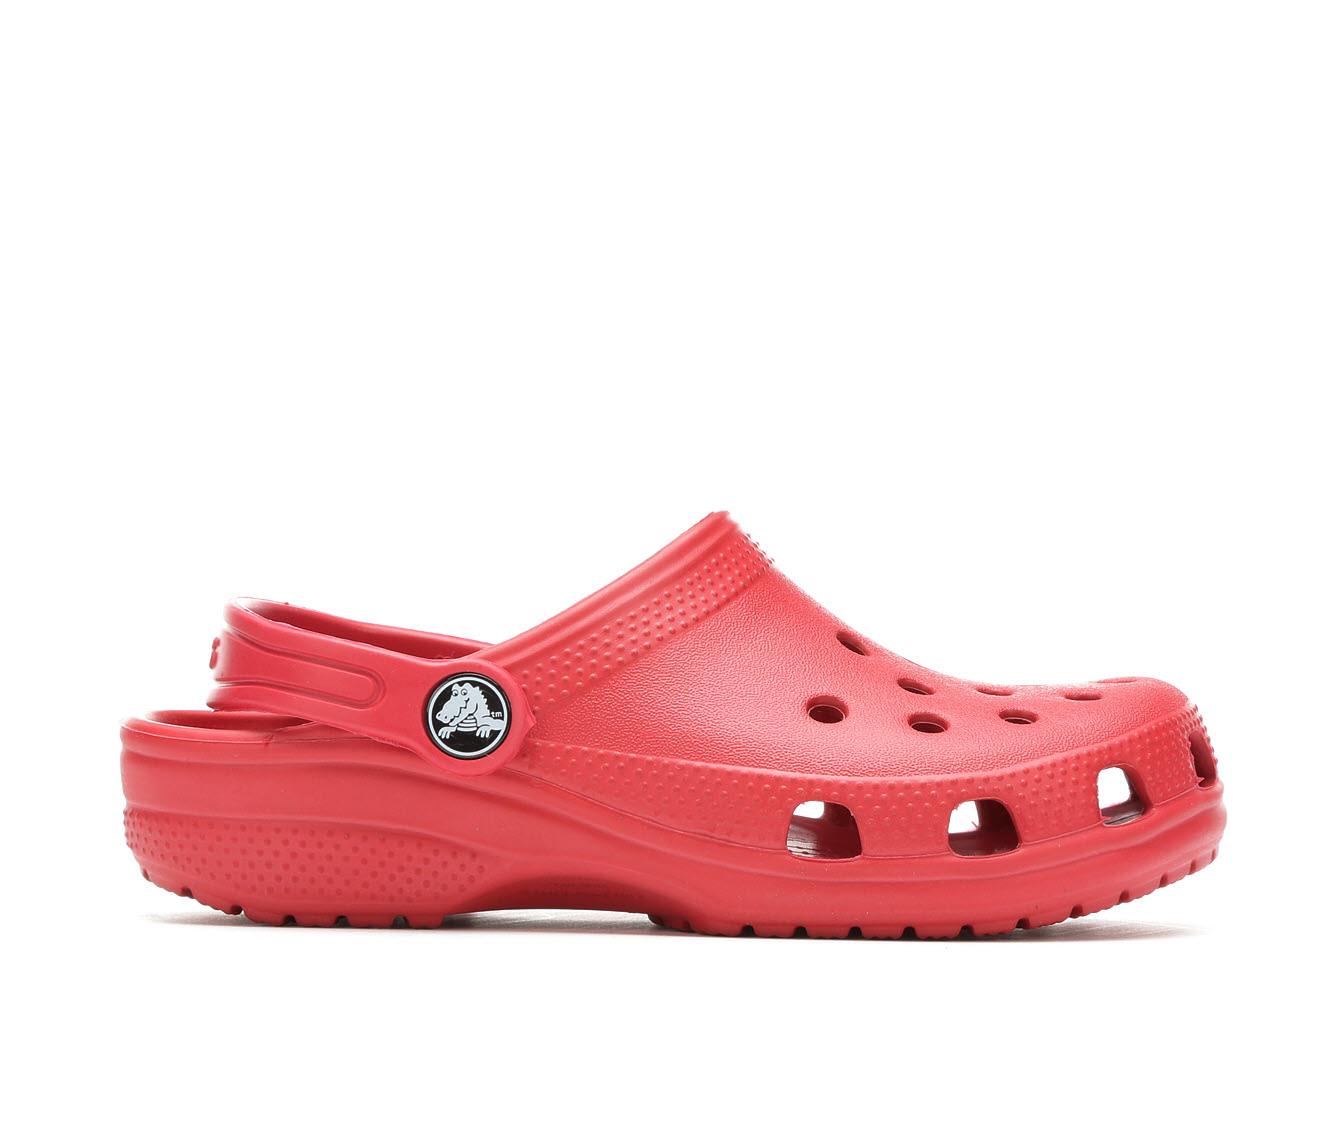 Girls' Crocs Classic Clog Children's Shoes (Red)